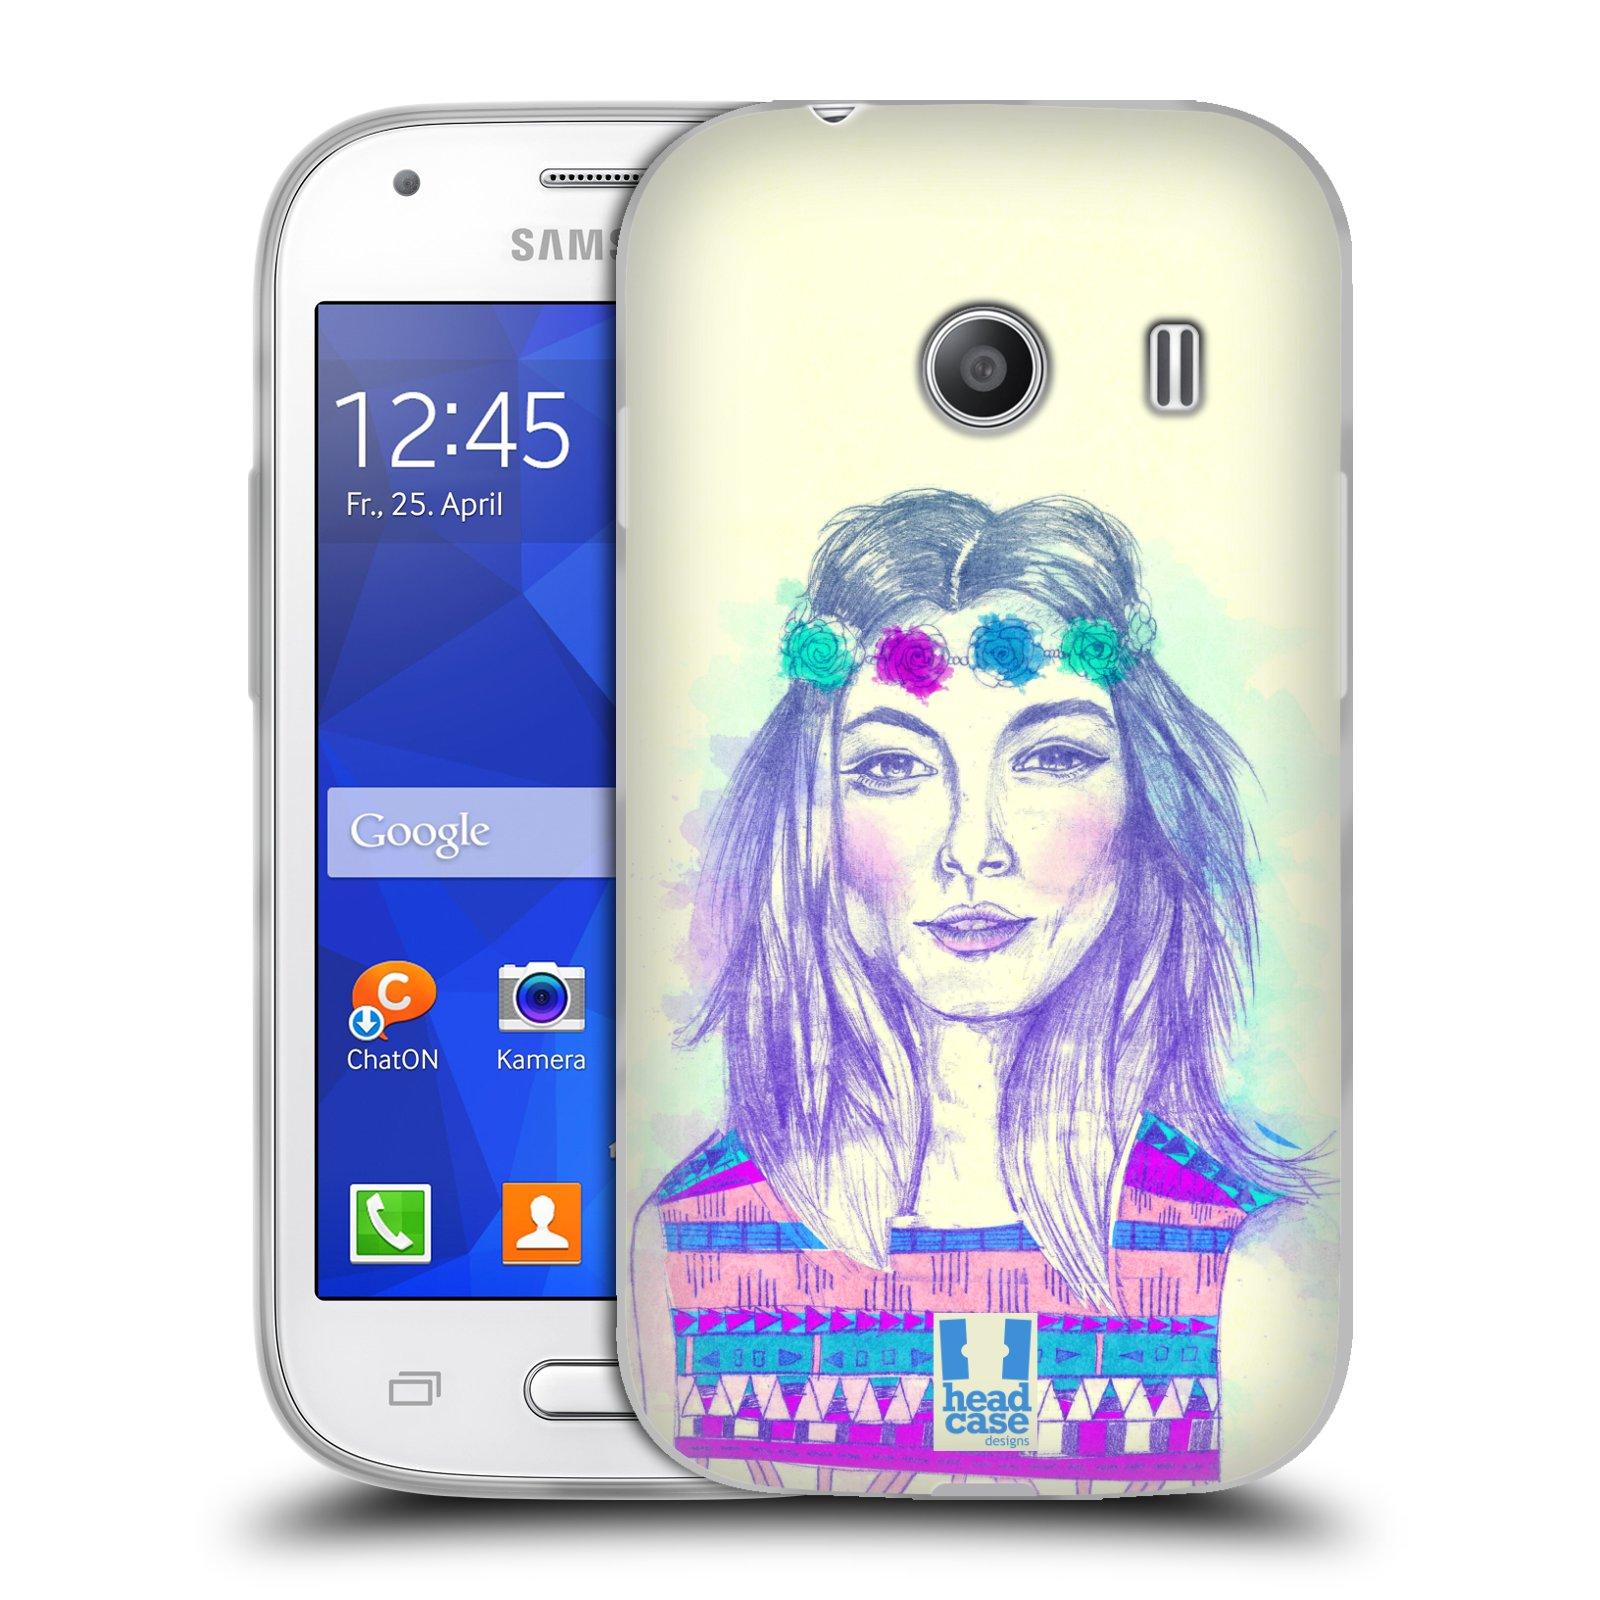 HEAD CASE silikonový obal na mobil Samsung Galaxy Ace Style (G310) vzor Dívka dlouhé květinové vlasy HIPPIE modrá